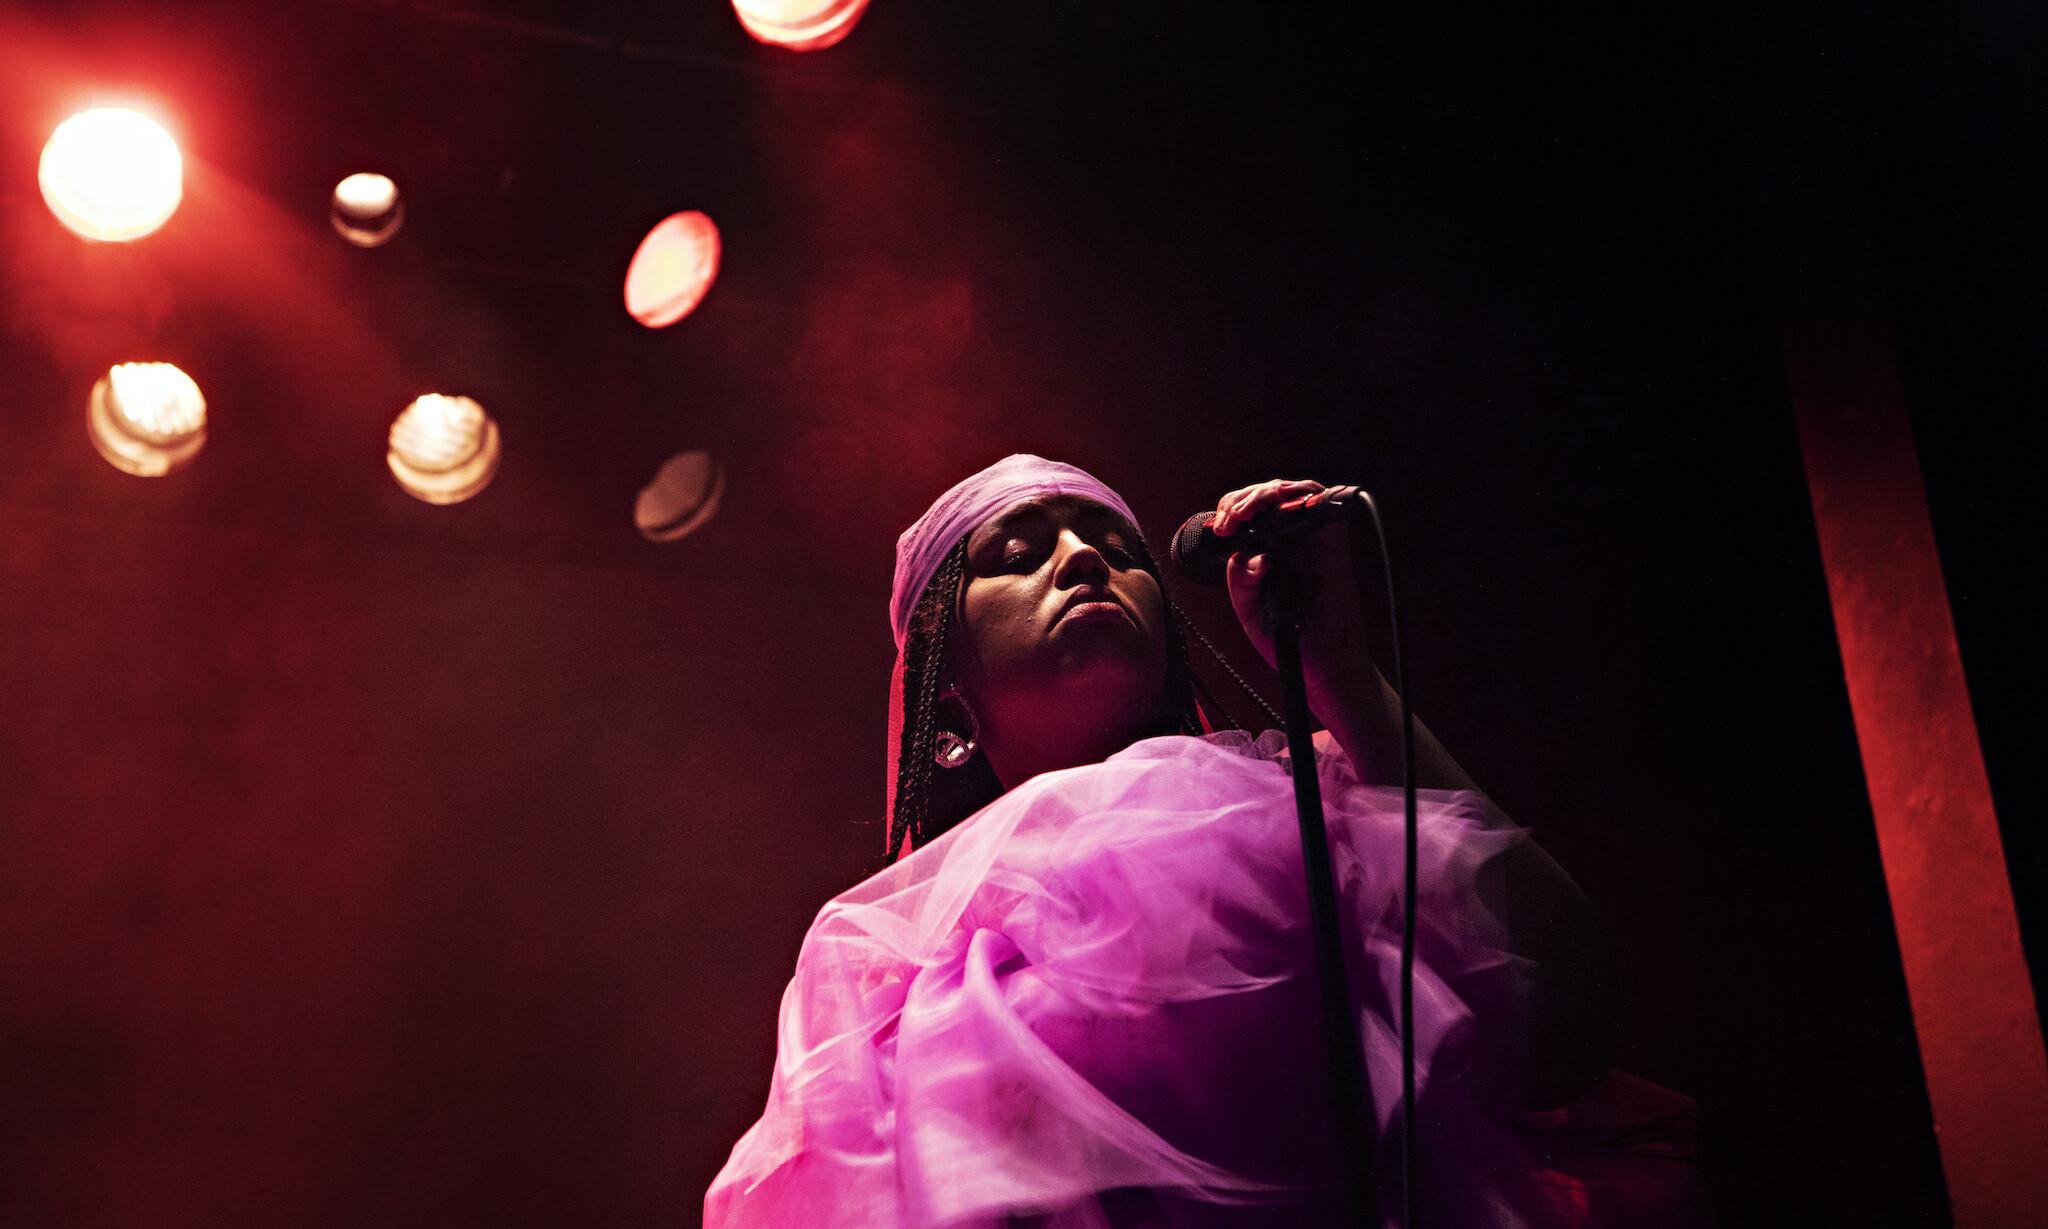 LIL HALIMA: Den 20 år gamle artisten spiller en særegen blanding mellom pop og r'n'b.